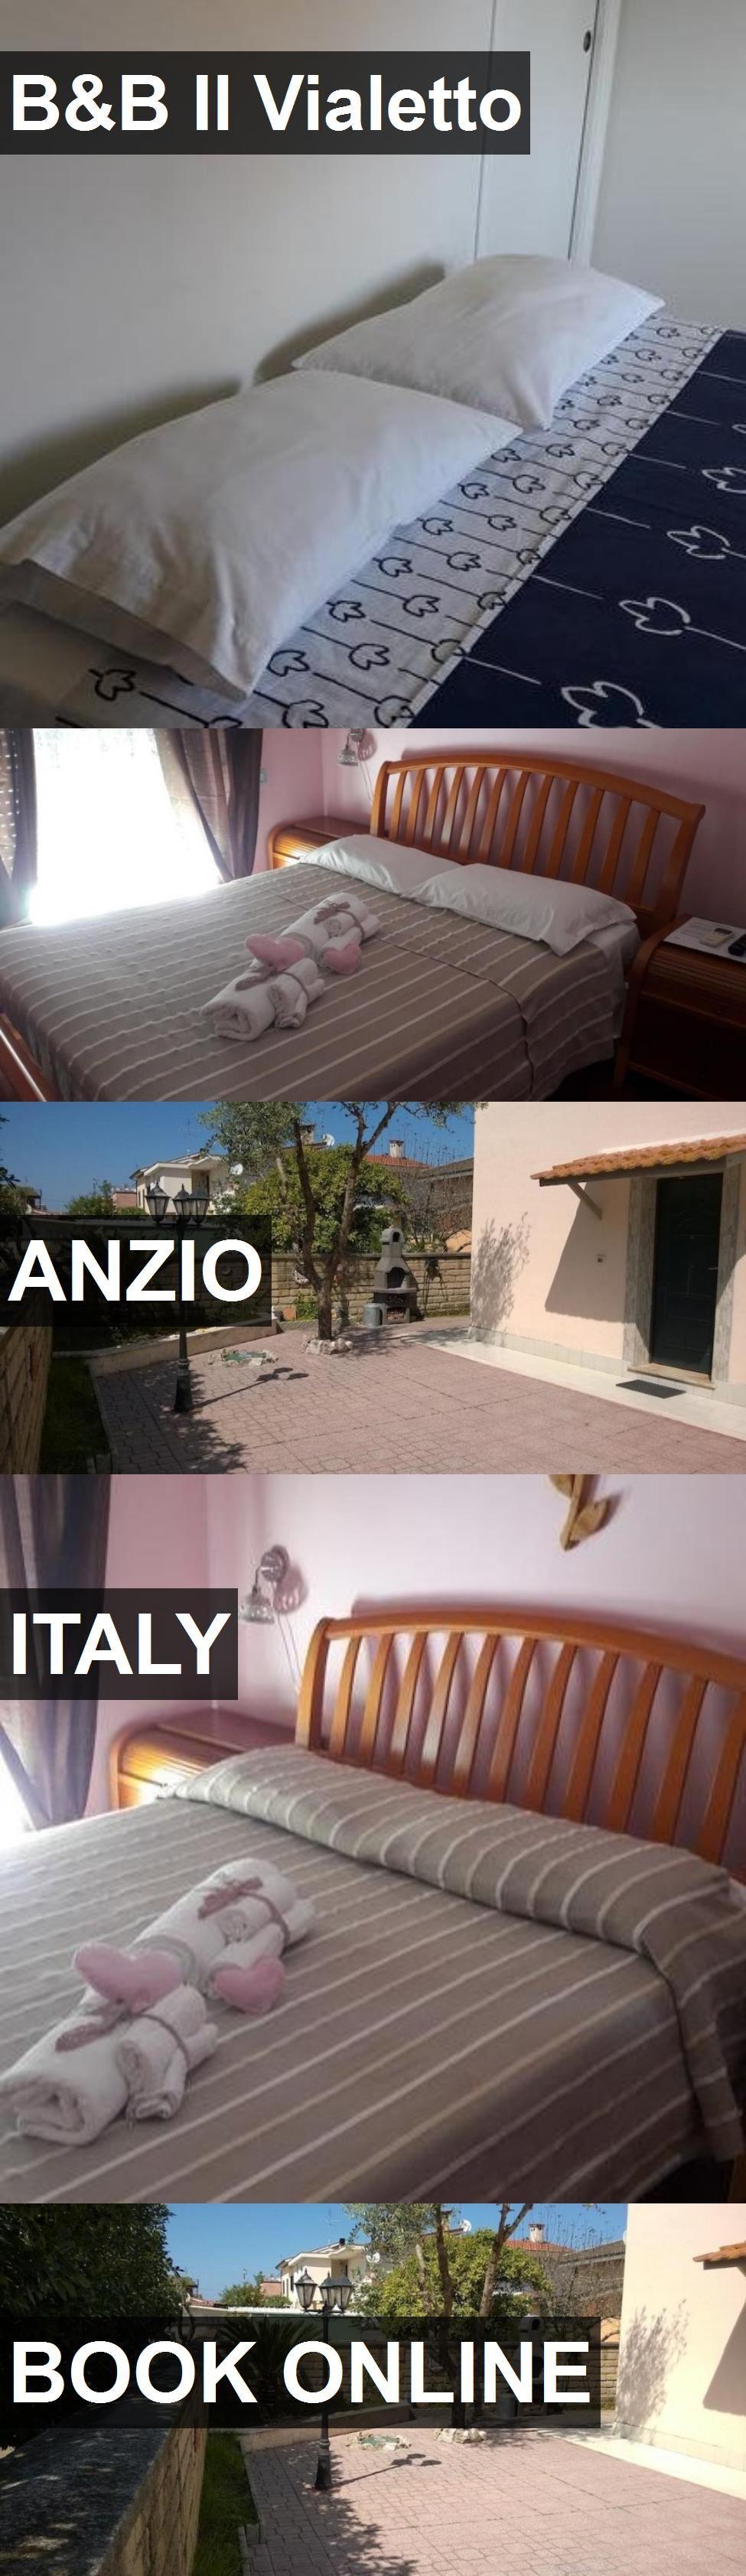 Hotel B Hotel Anzio Italy